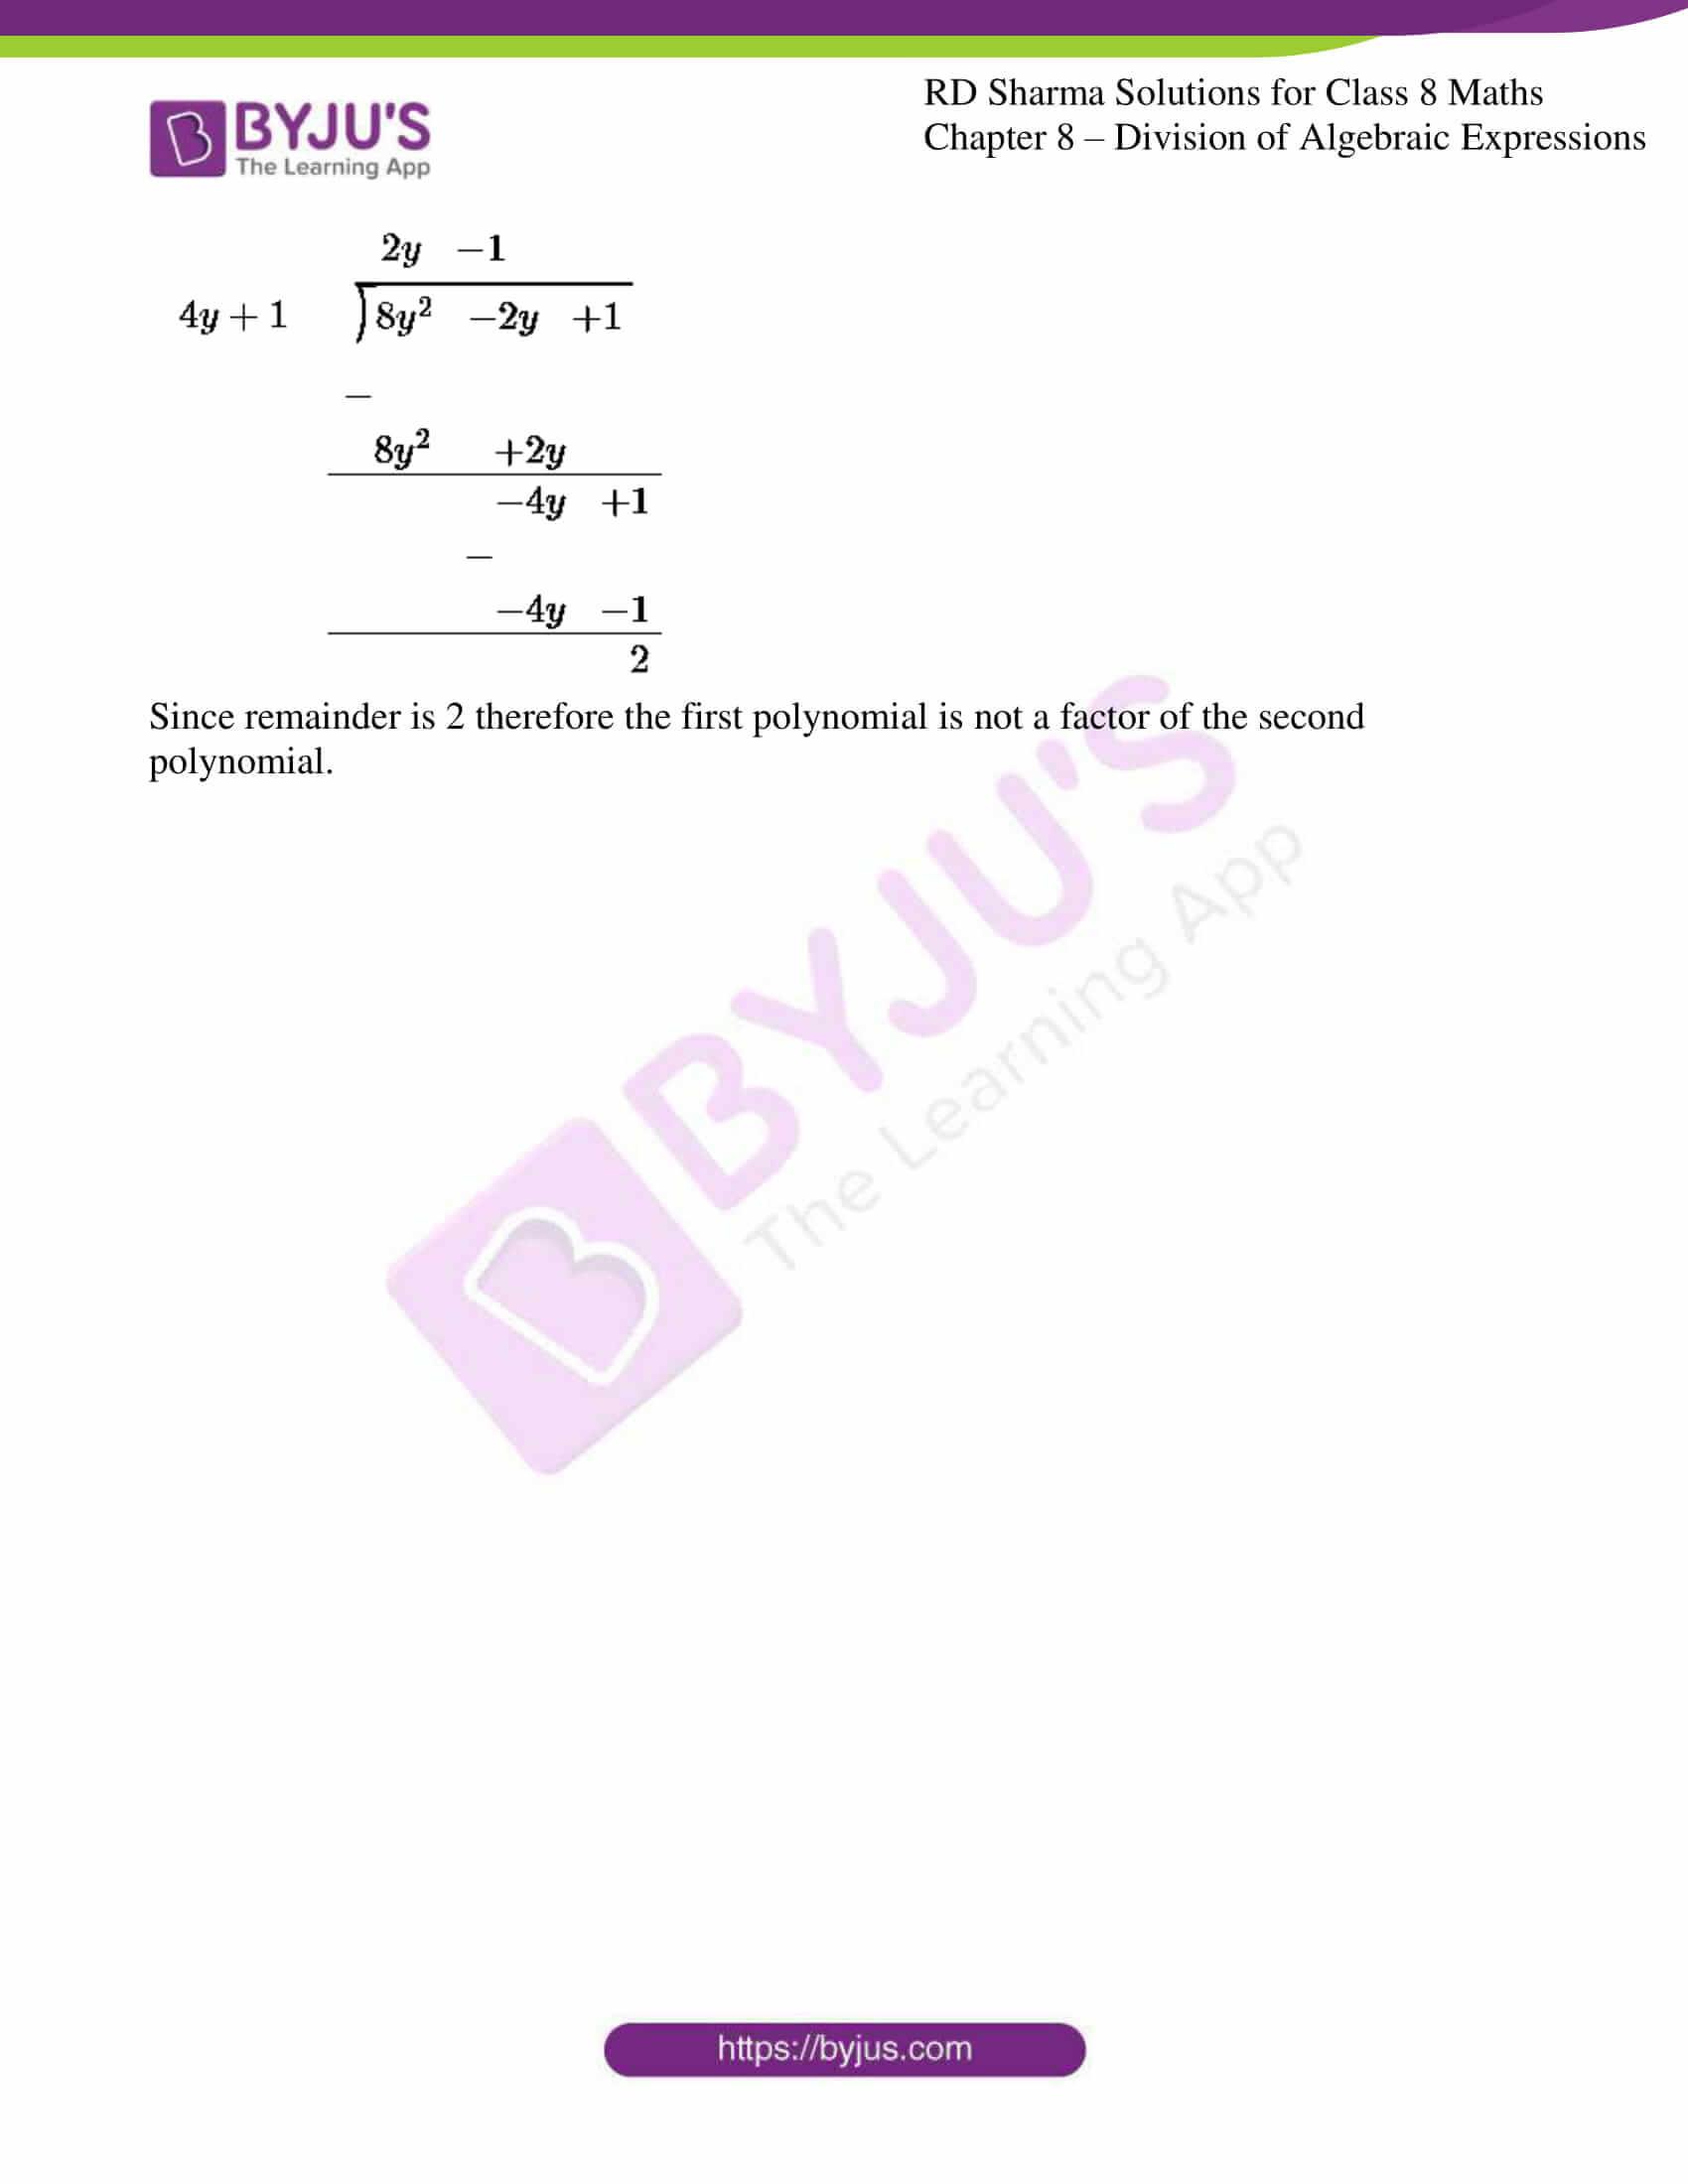 rd sharma class 8 maths chapter 8 exercise 5 6